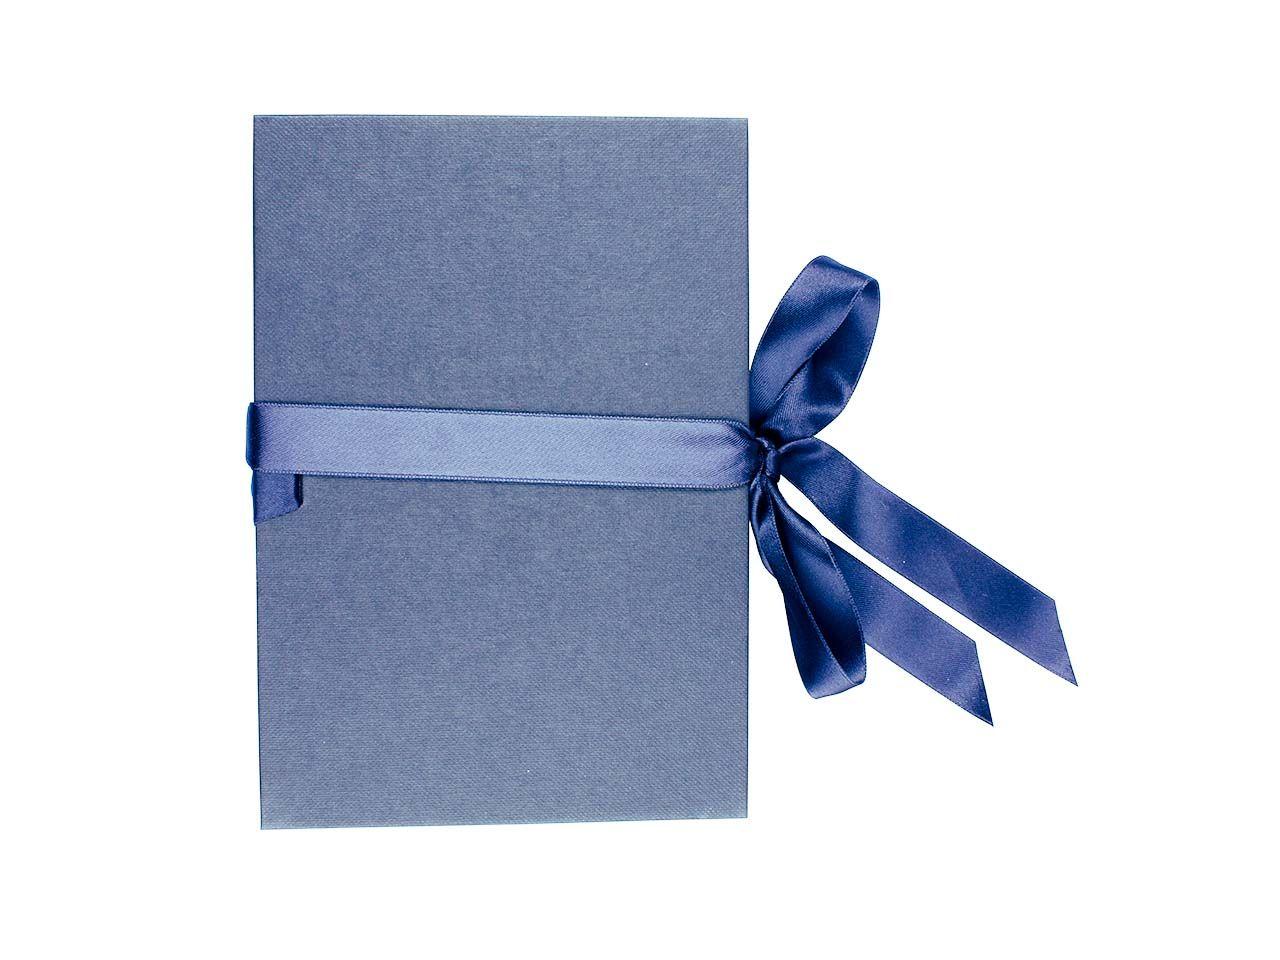 Foto-Leporello blau, 17,5x12cm 0635ef blau